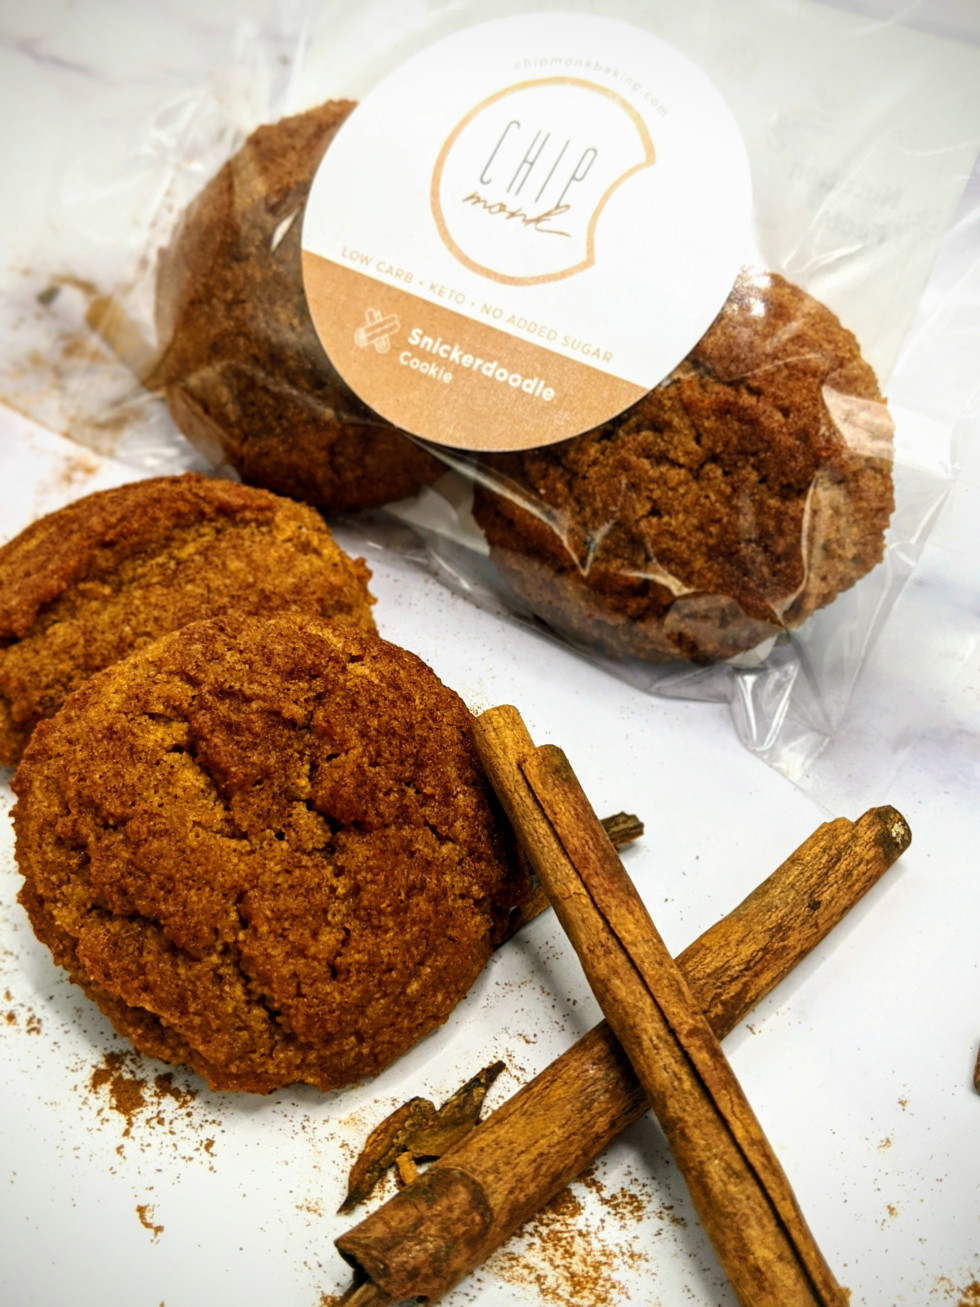 ChipMonk baking snickerdoodle